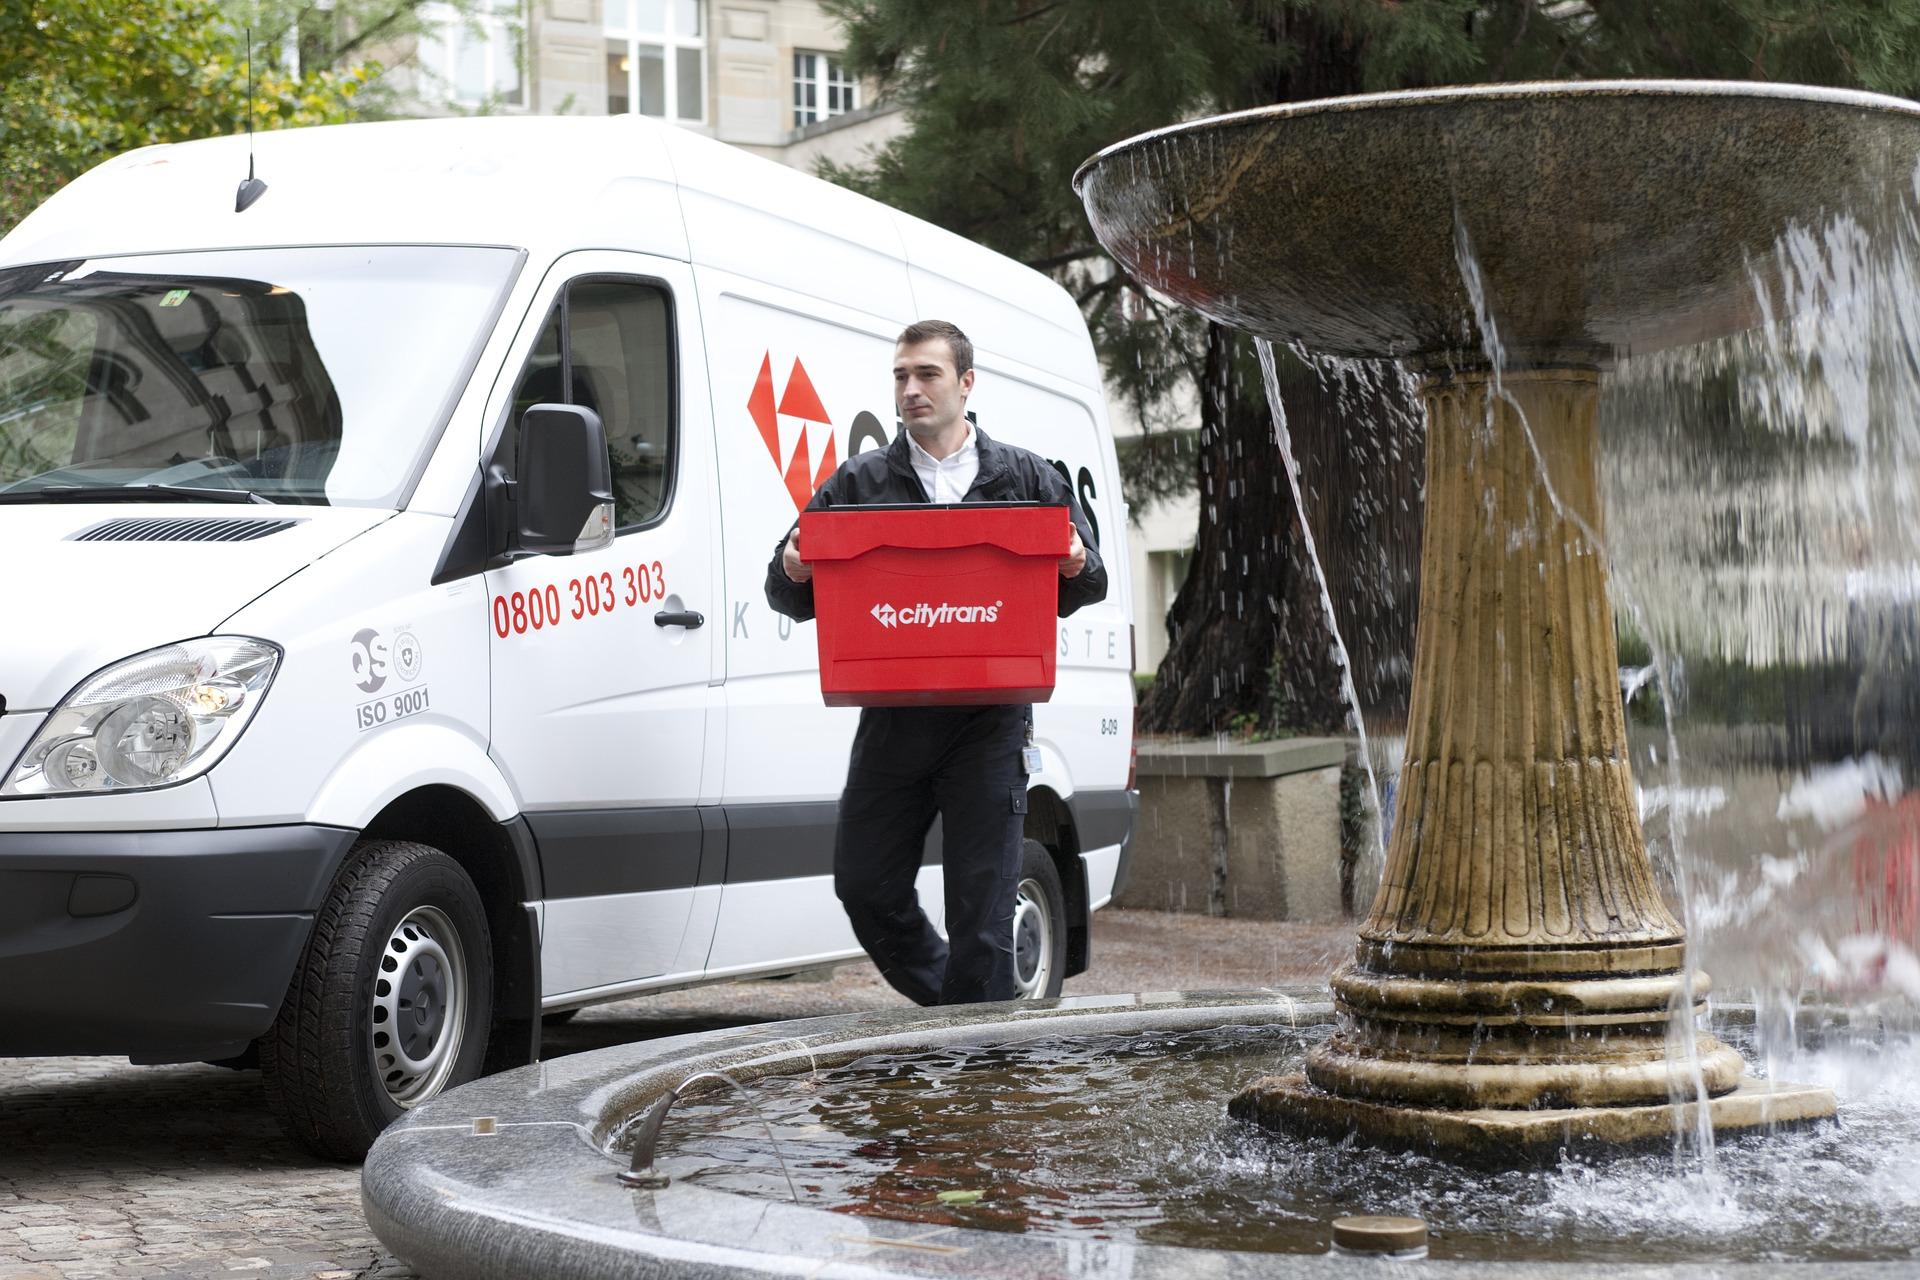 Bristol Council Buys Diesel Vans After Banning Diesels...